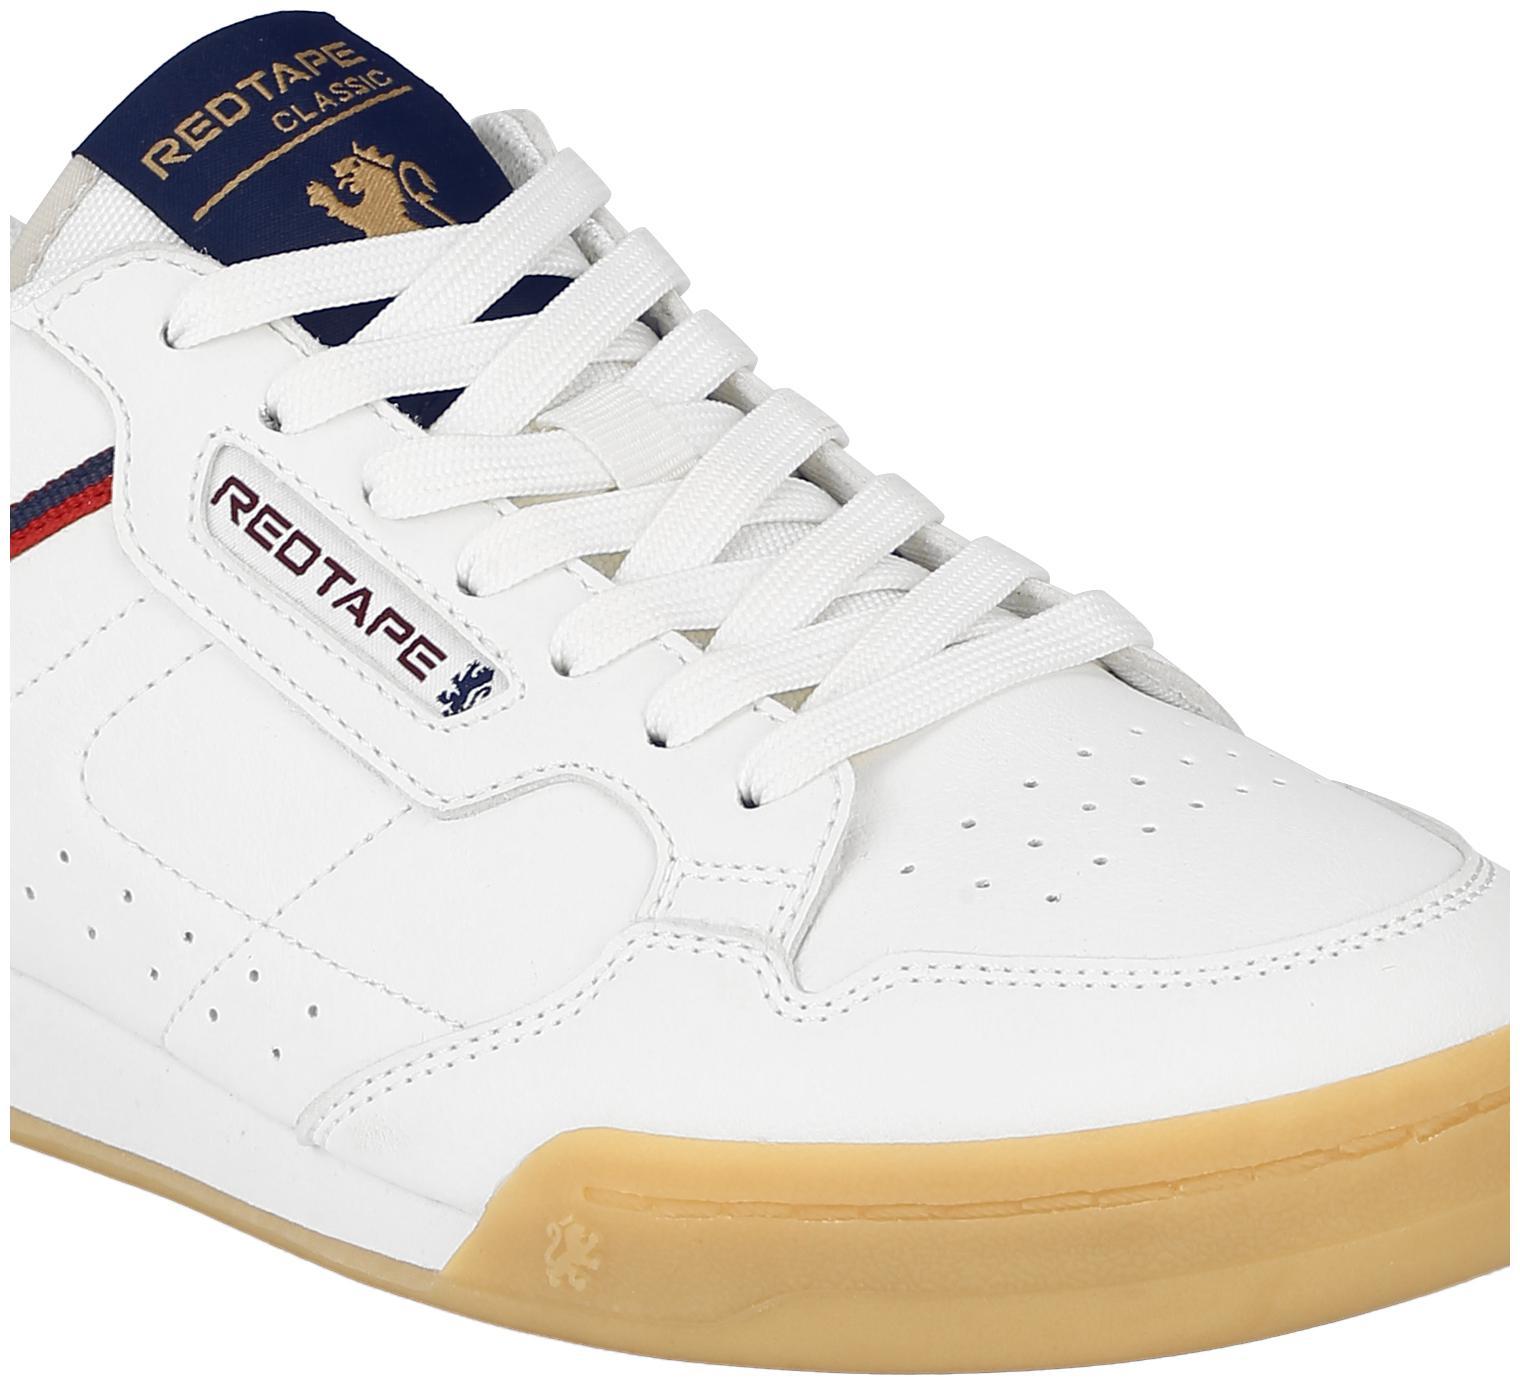 Buy Red Tape Classic Shoe Men White